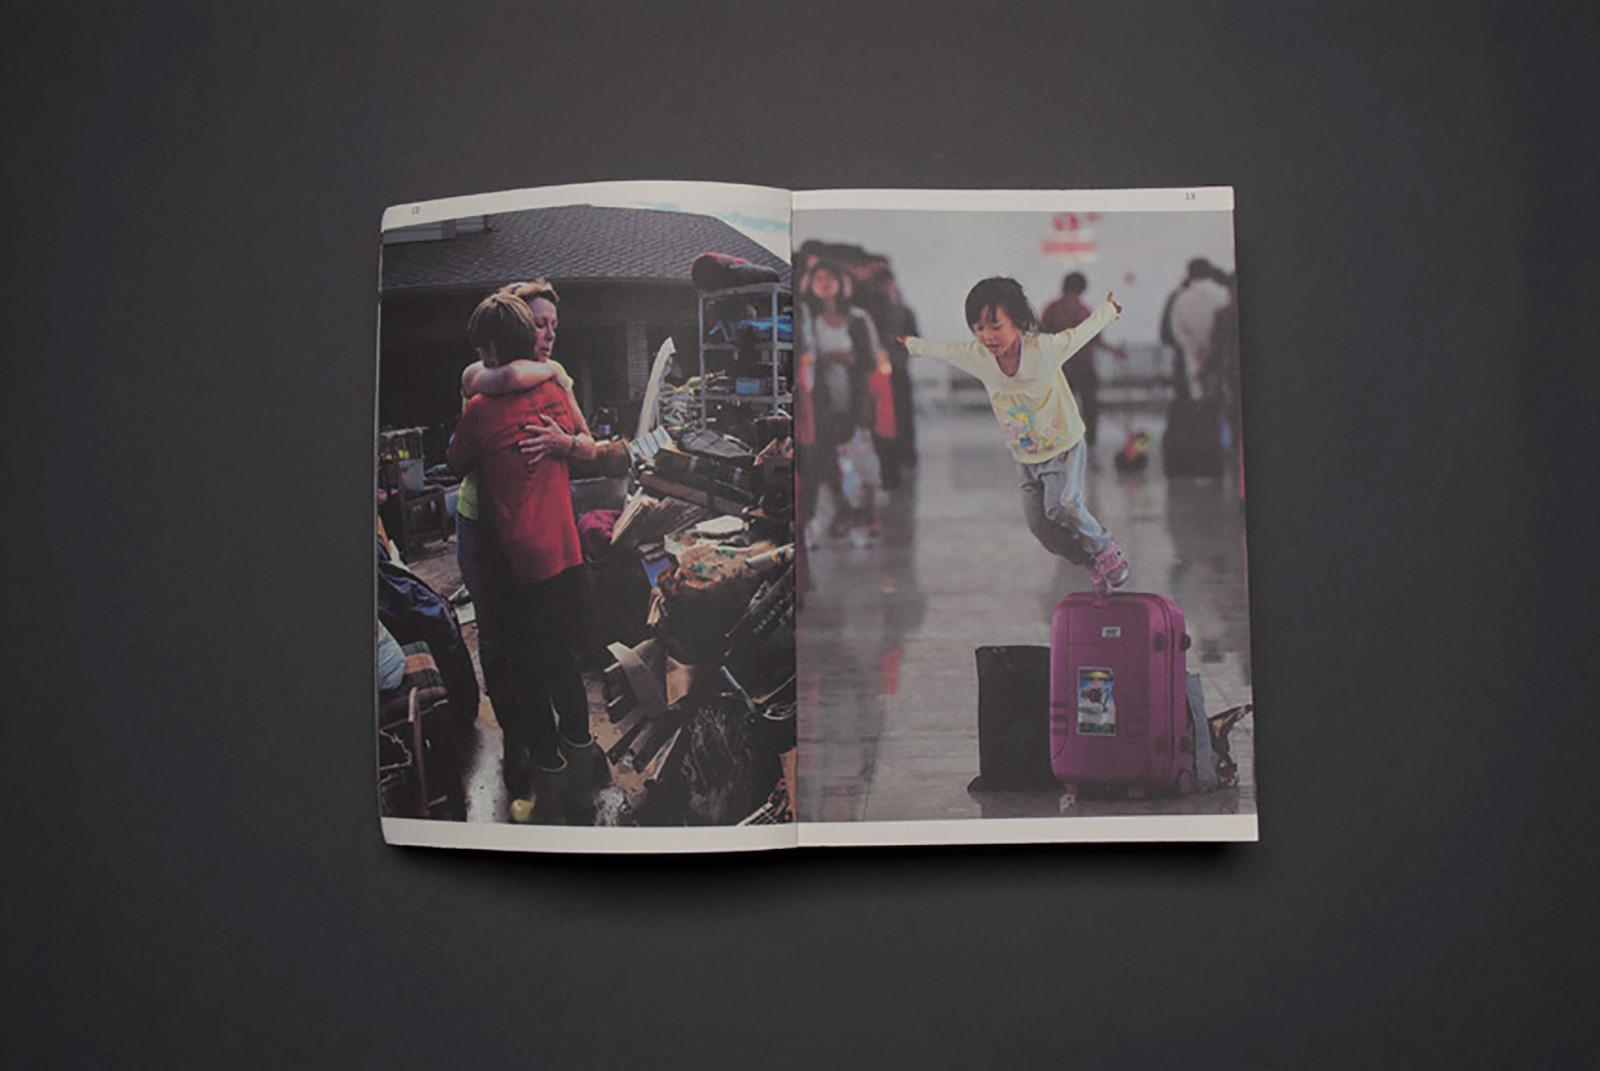 whats-inside-the-koffer-book-wilco-monen-04.jpg